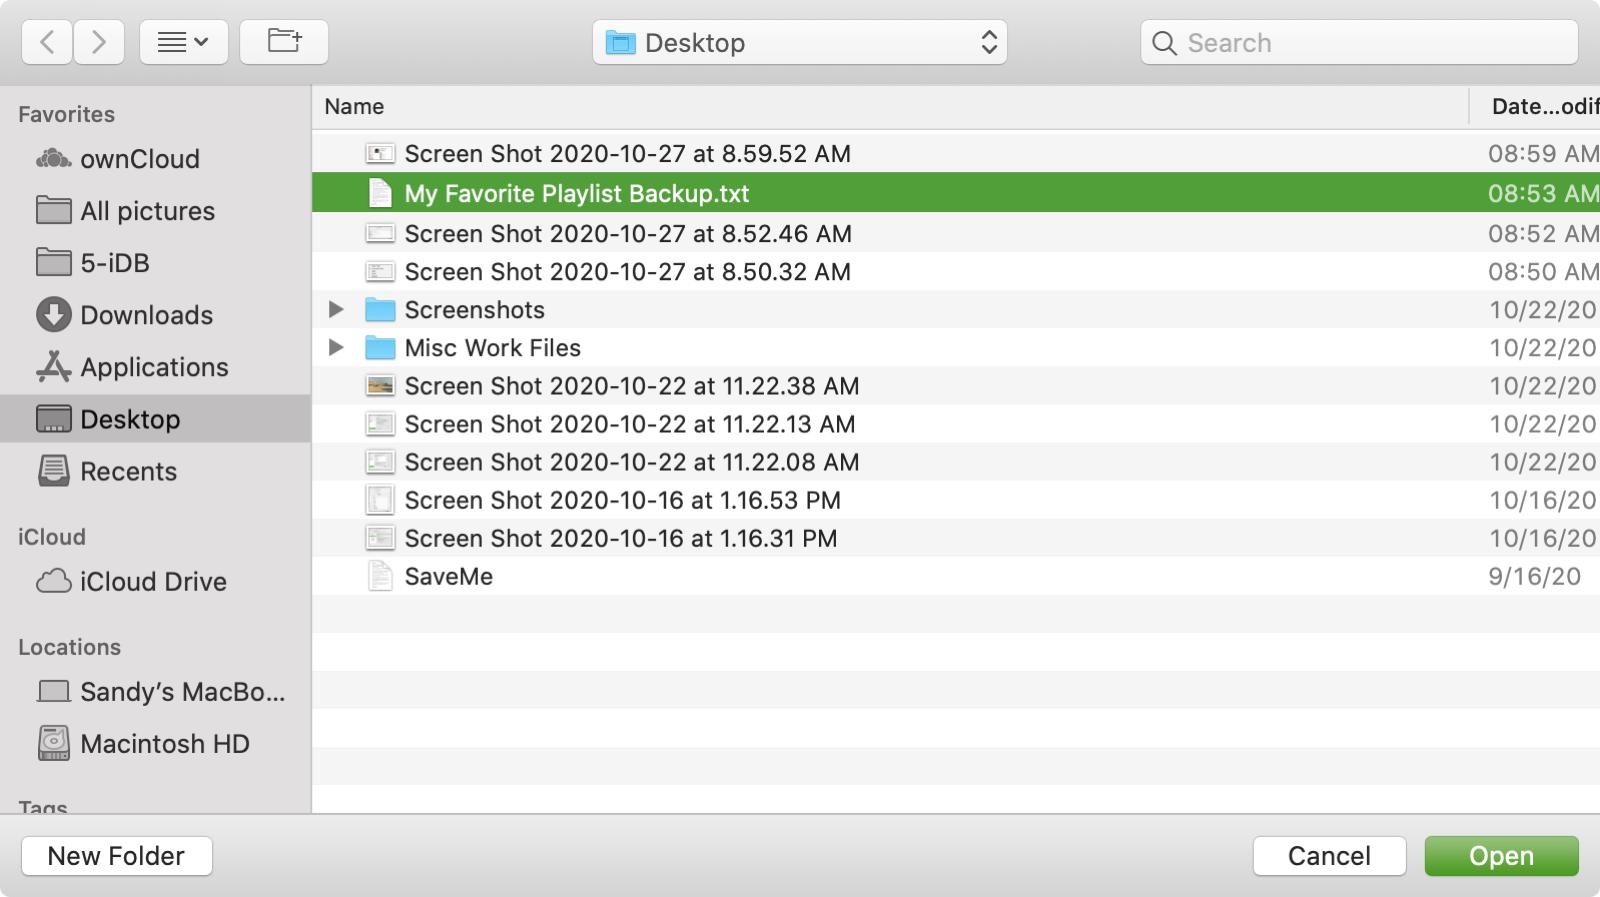 Import an Apple Music Playlist on Mac